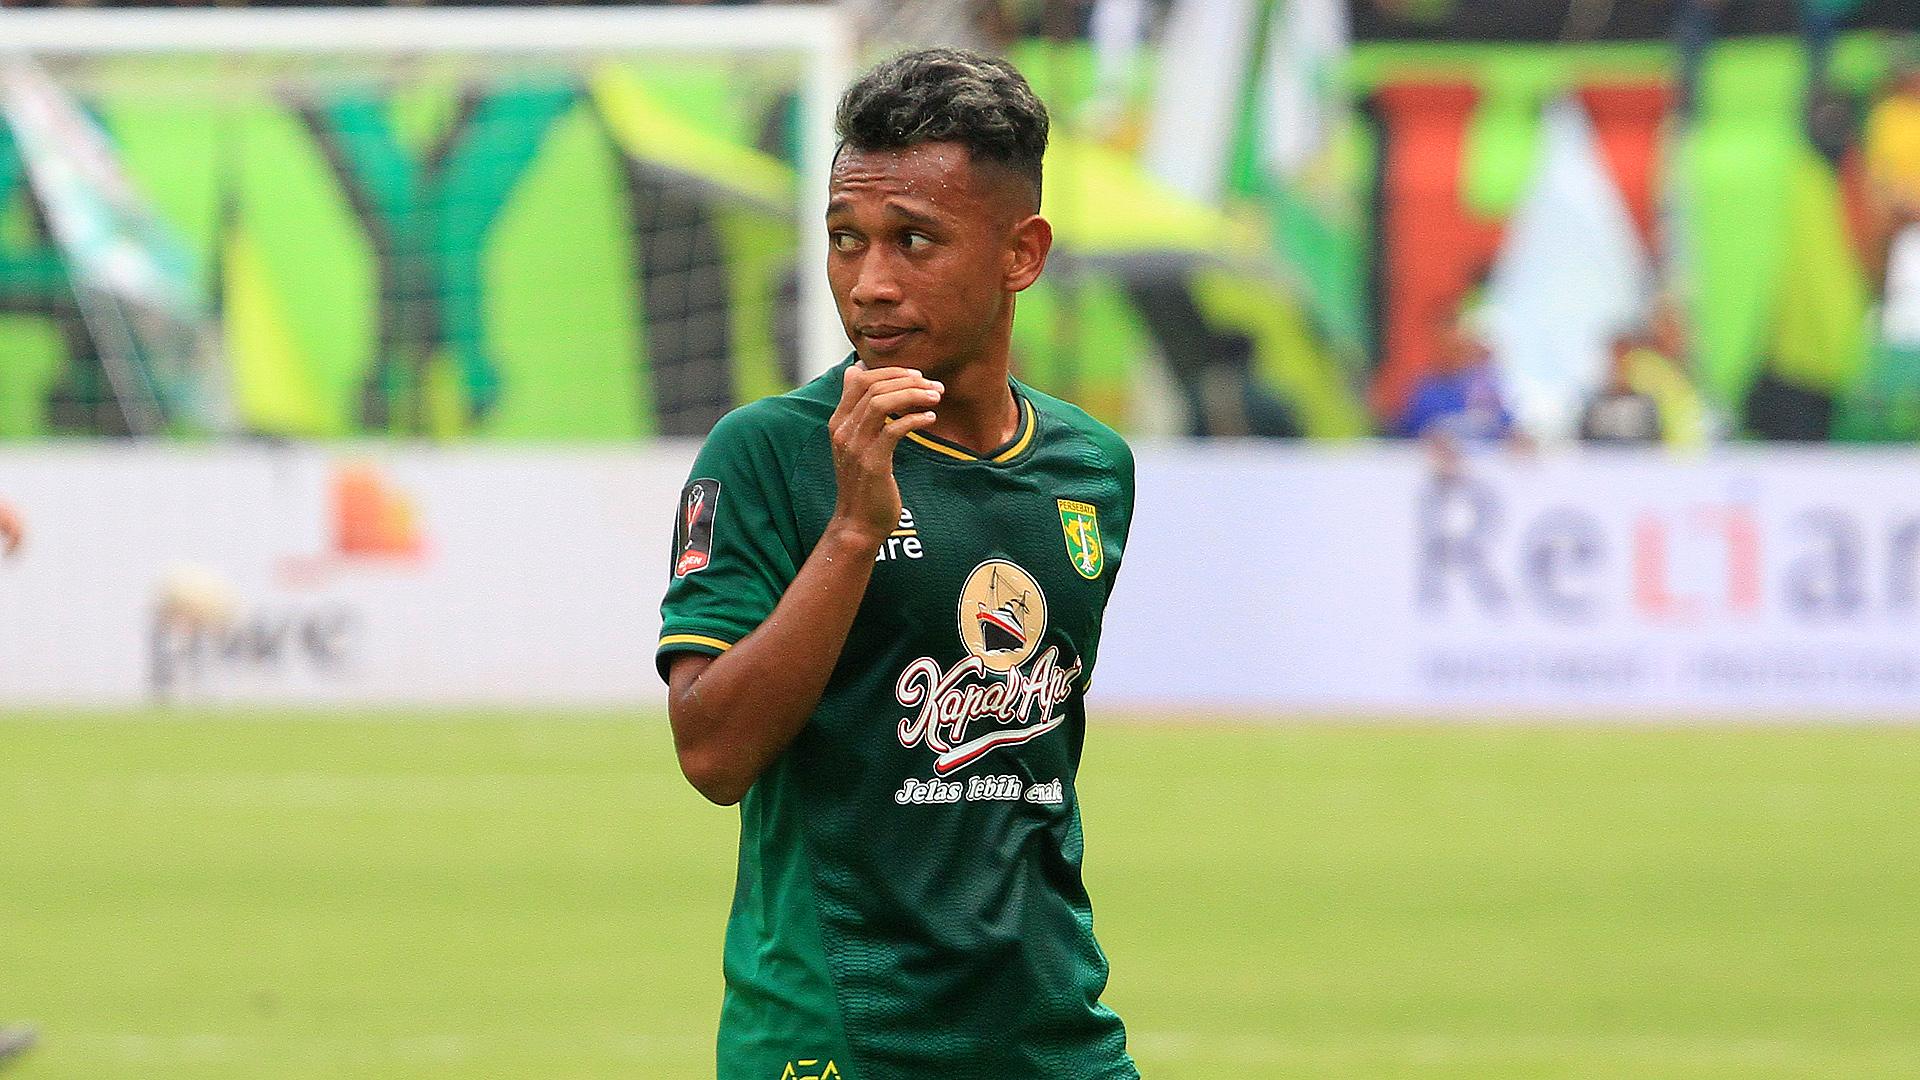 Irfan Jaya Sulit Temukan Next Bepe Goalcom